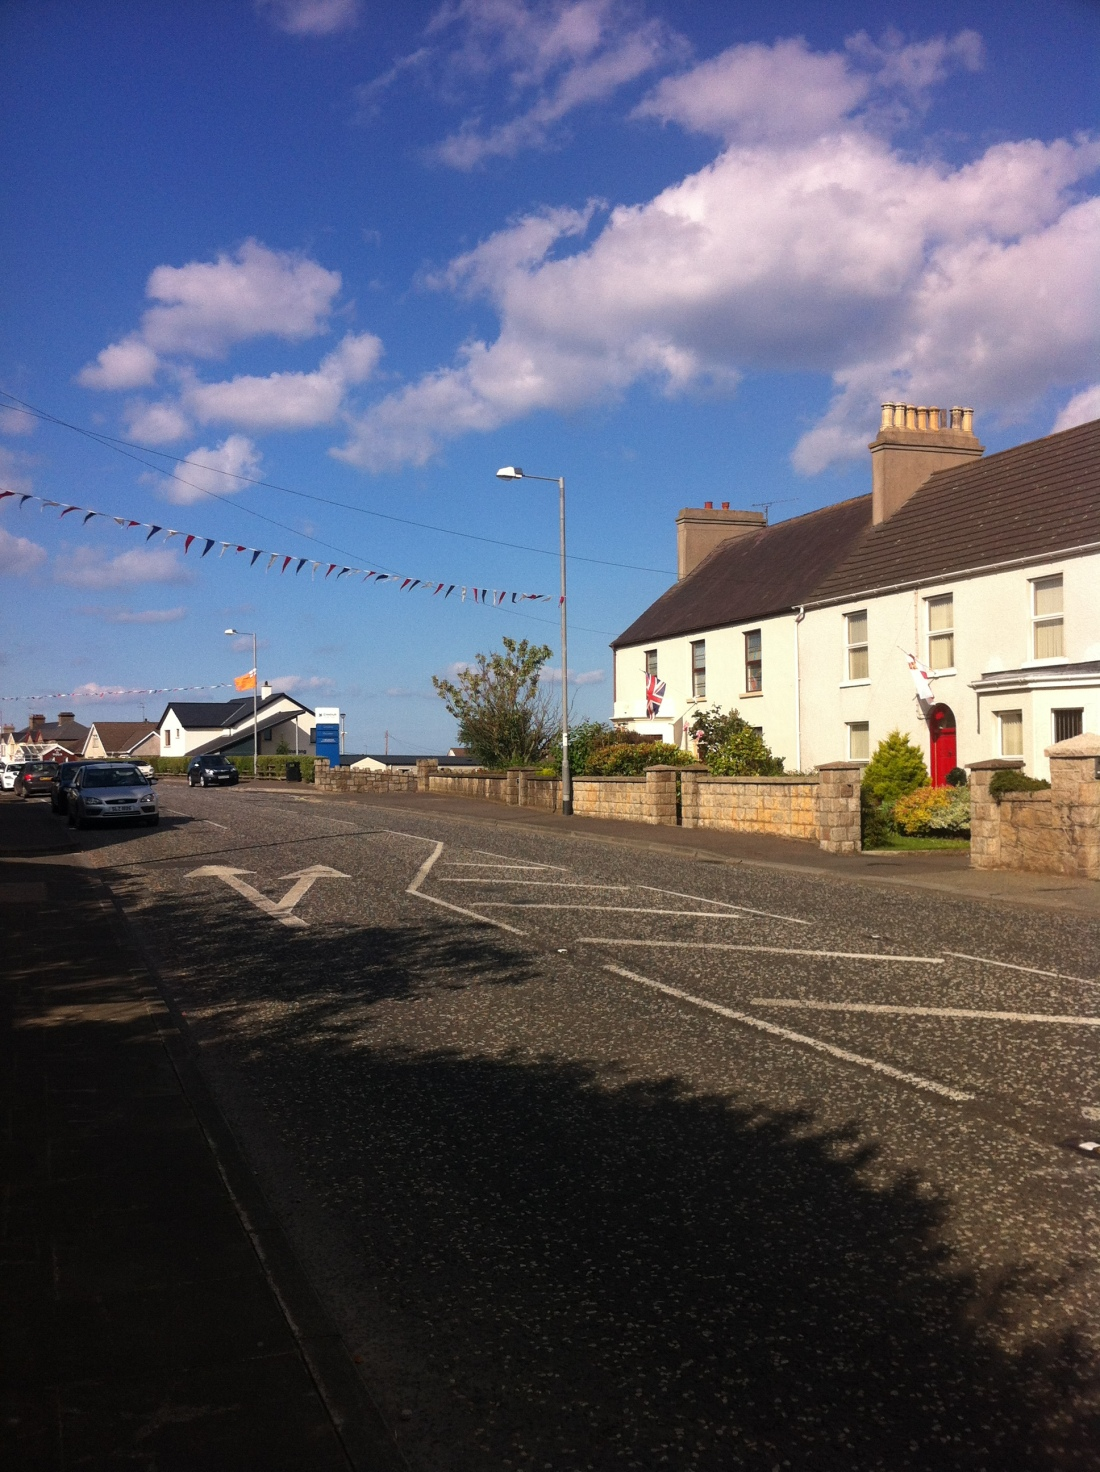 Town of the Milkshake, Northern Ireland